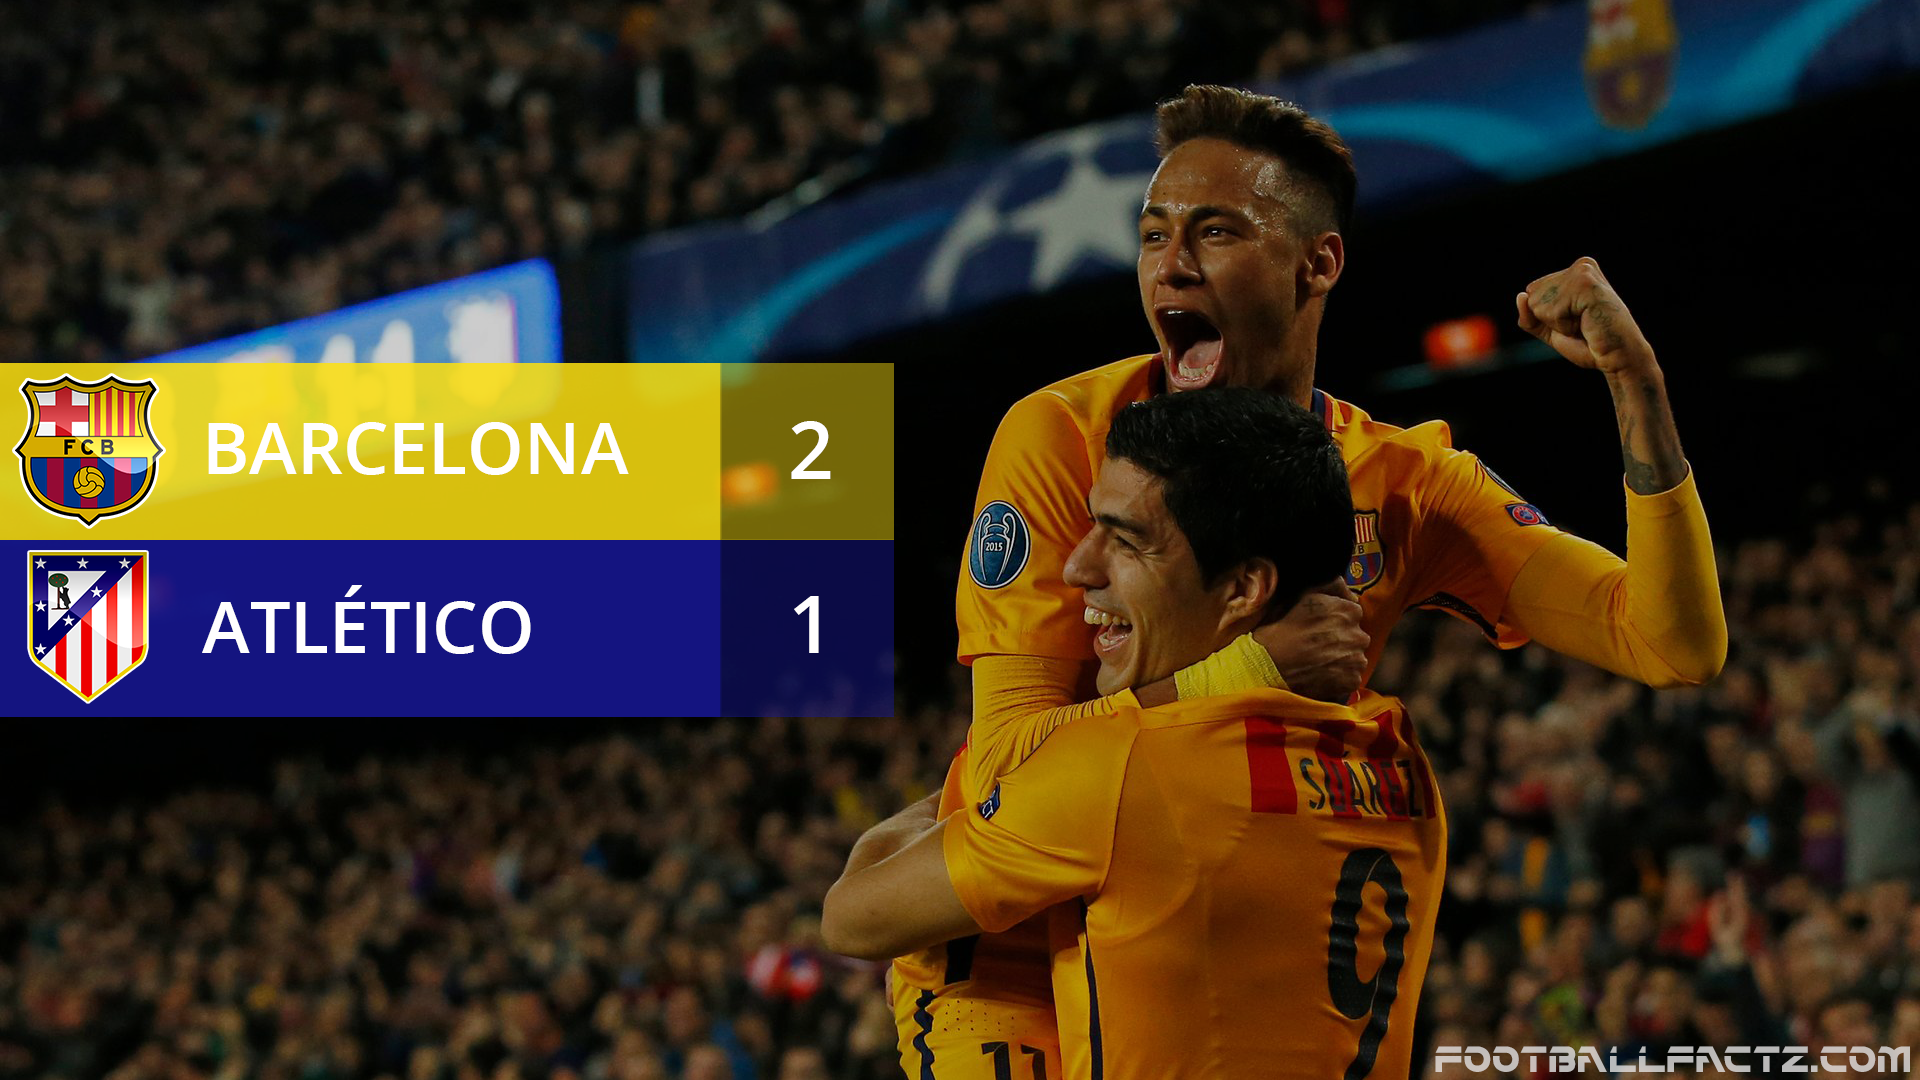 Barcelona 2 - 1 Atletico Madrid, Champions League